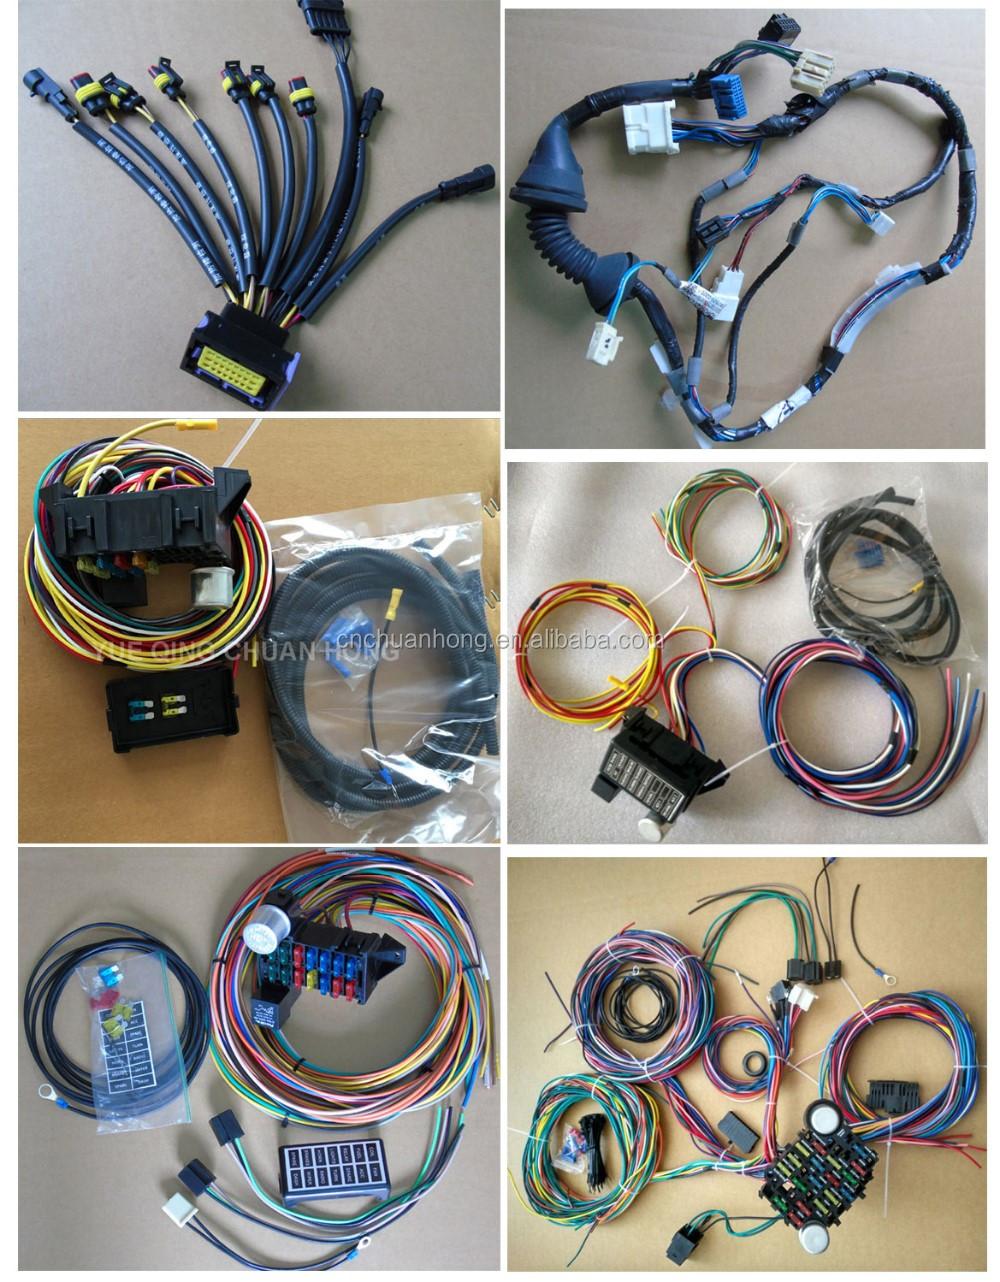 hight resolution of wiring specialties engine tranny harness 2jzgte vvti into universal application